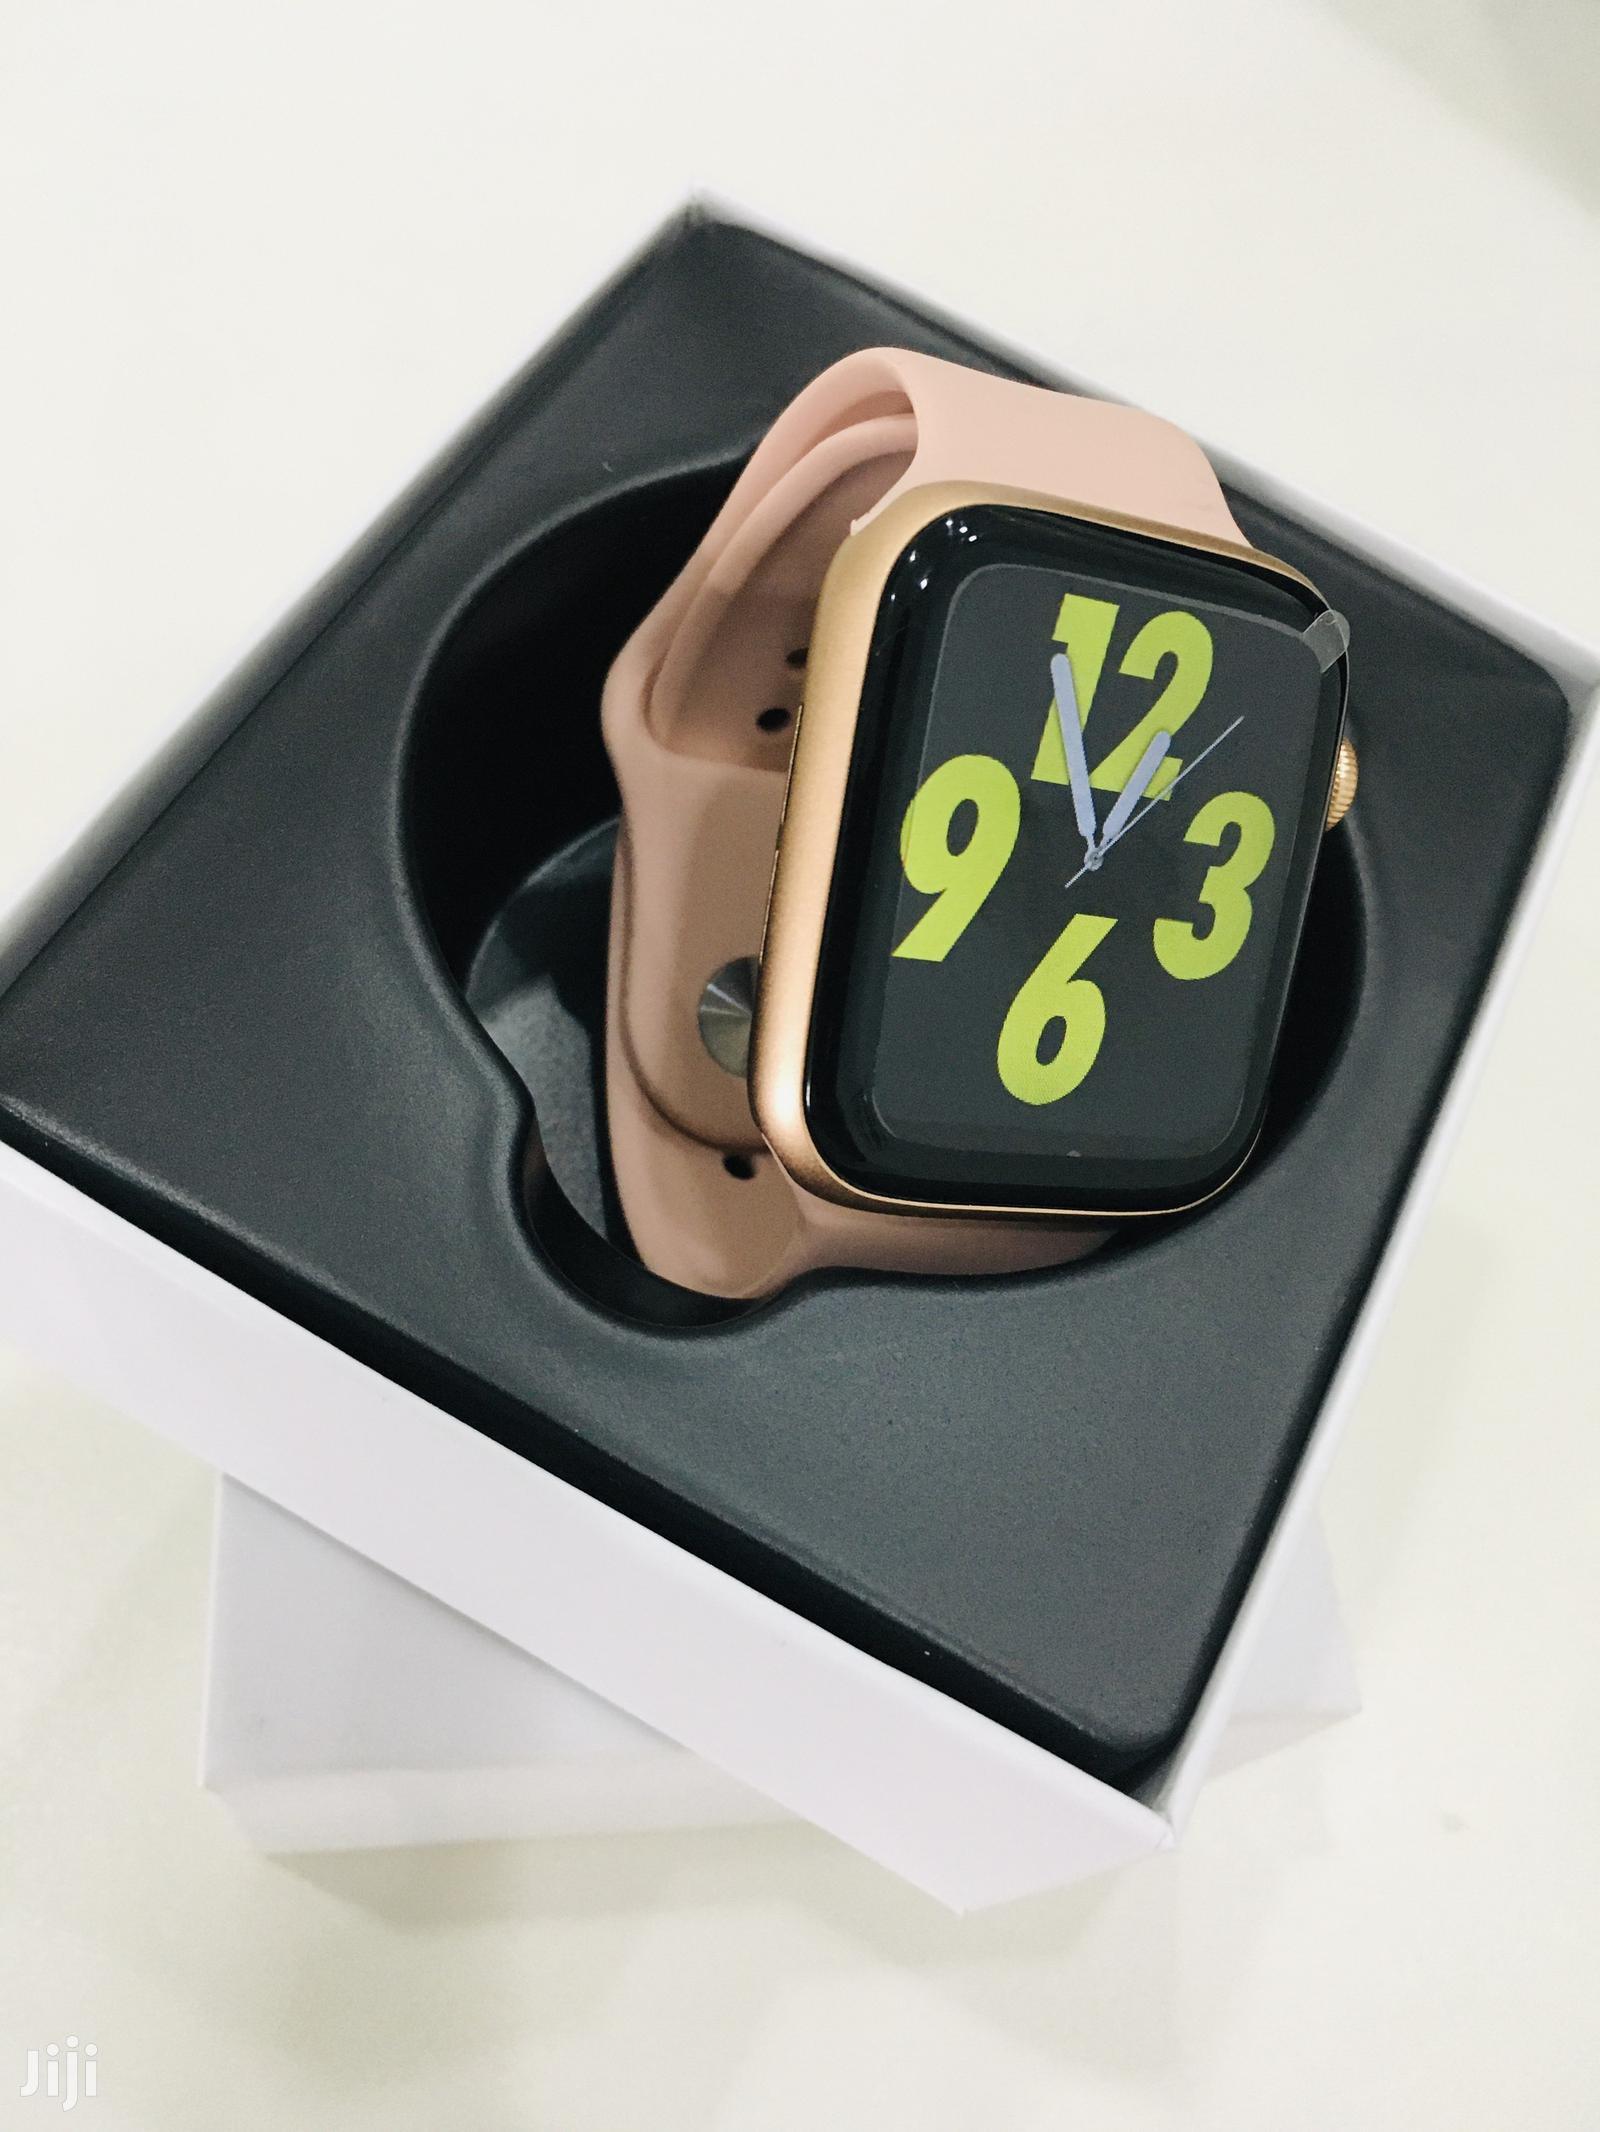 Smart Watch 6 | Smart Watches & Trackers for sale in Kinondoni, Dar es Salaam, Tanzania